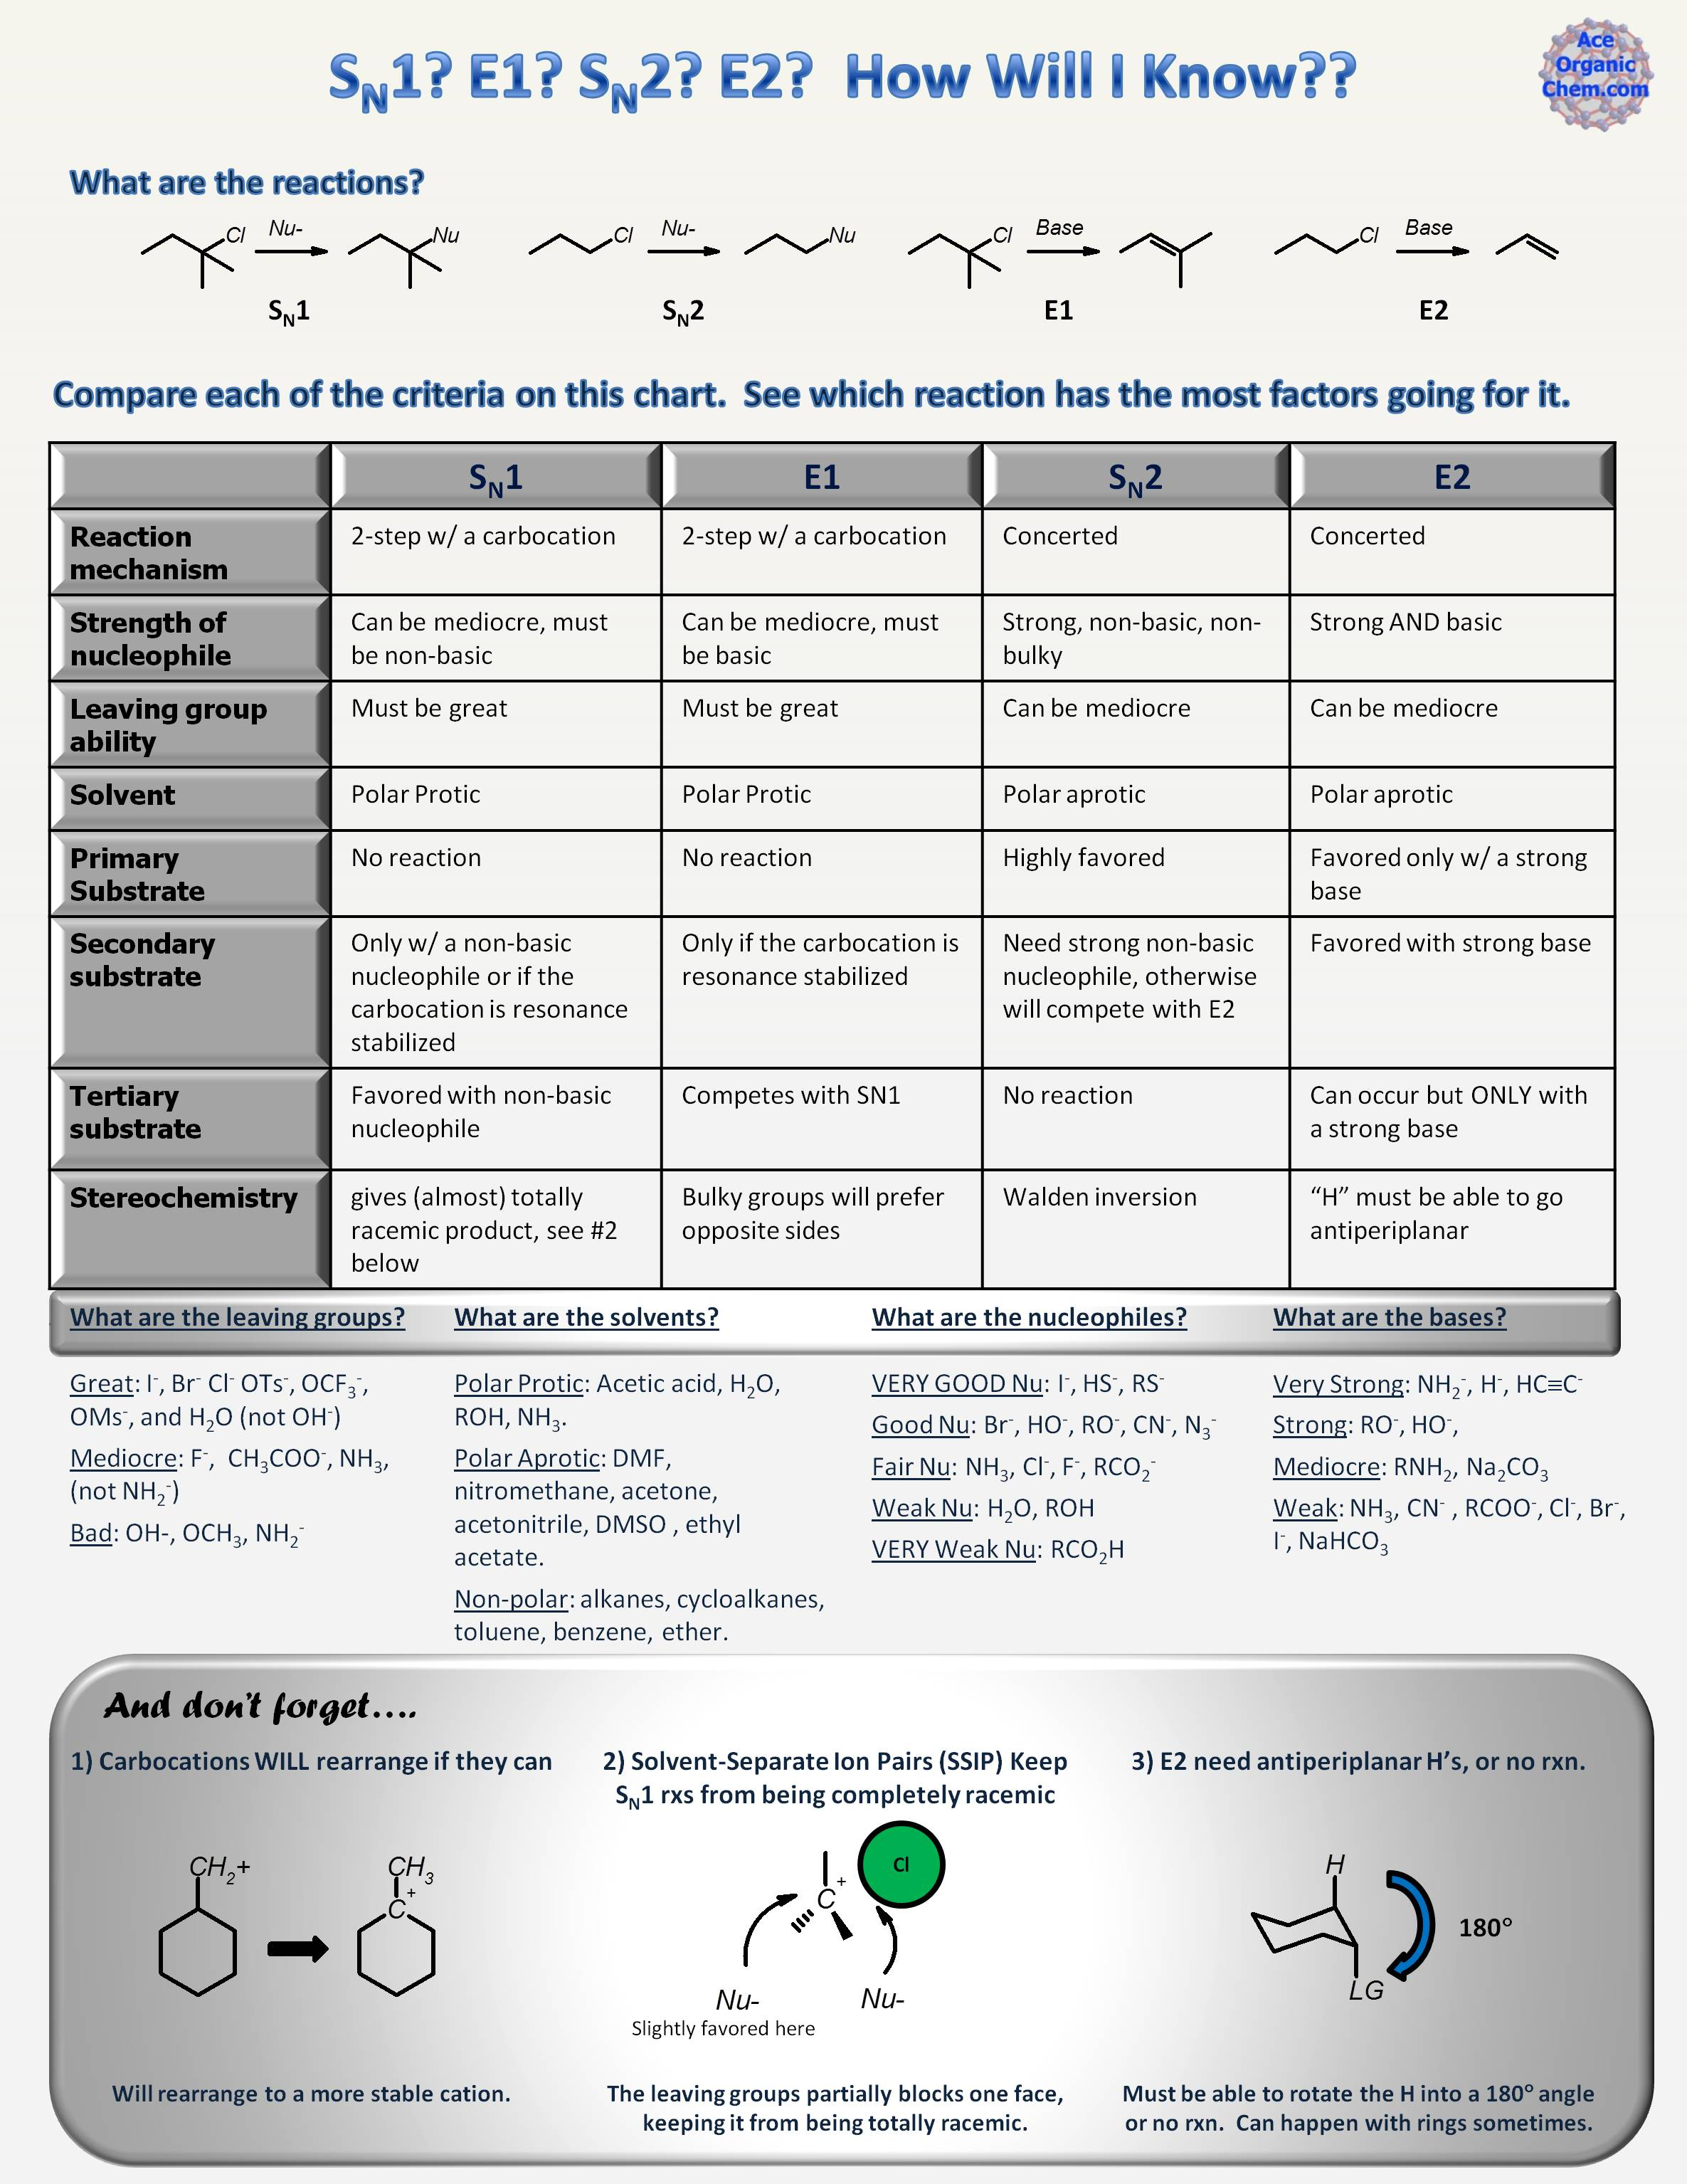 organic chemistry help organic chemistry made easy tag archives organic chemistry help